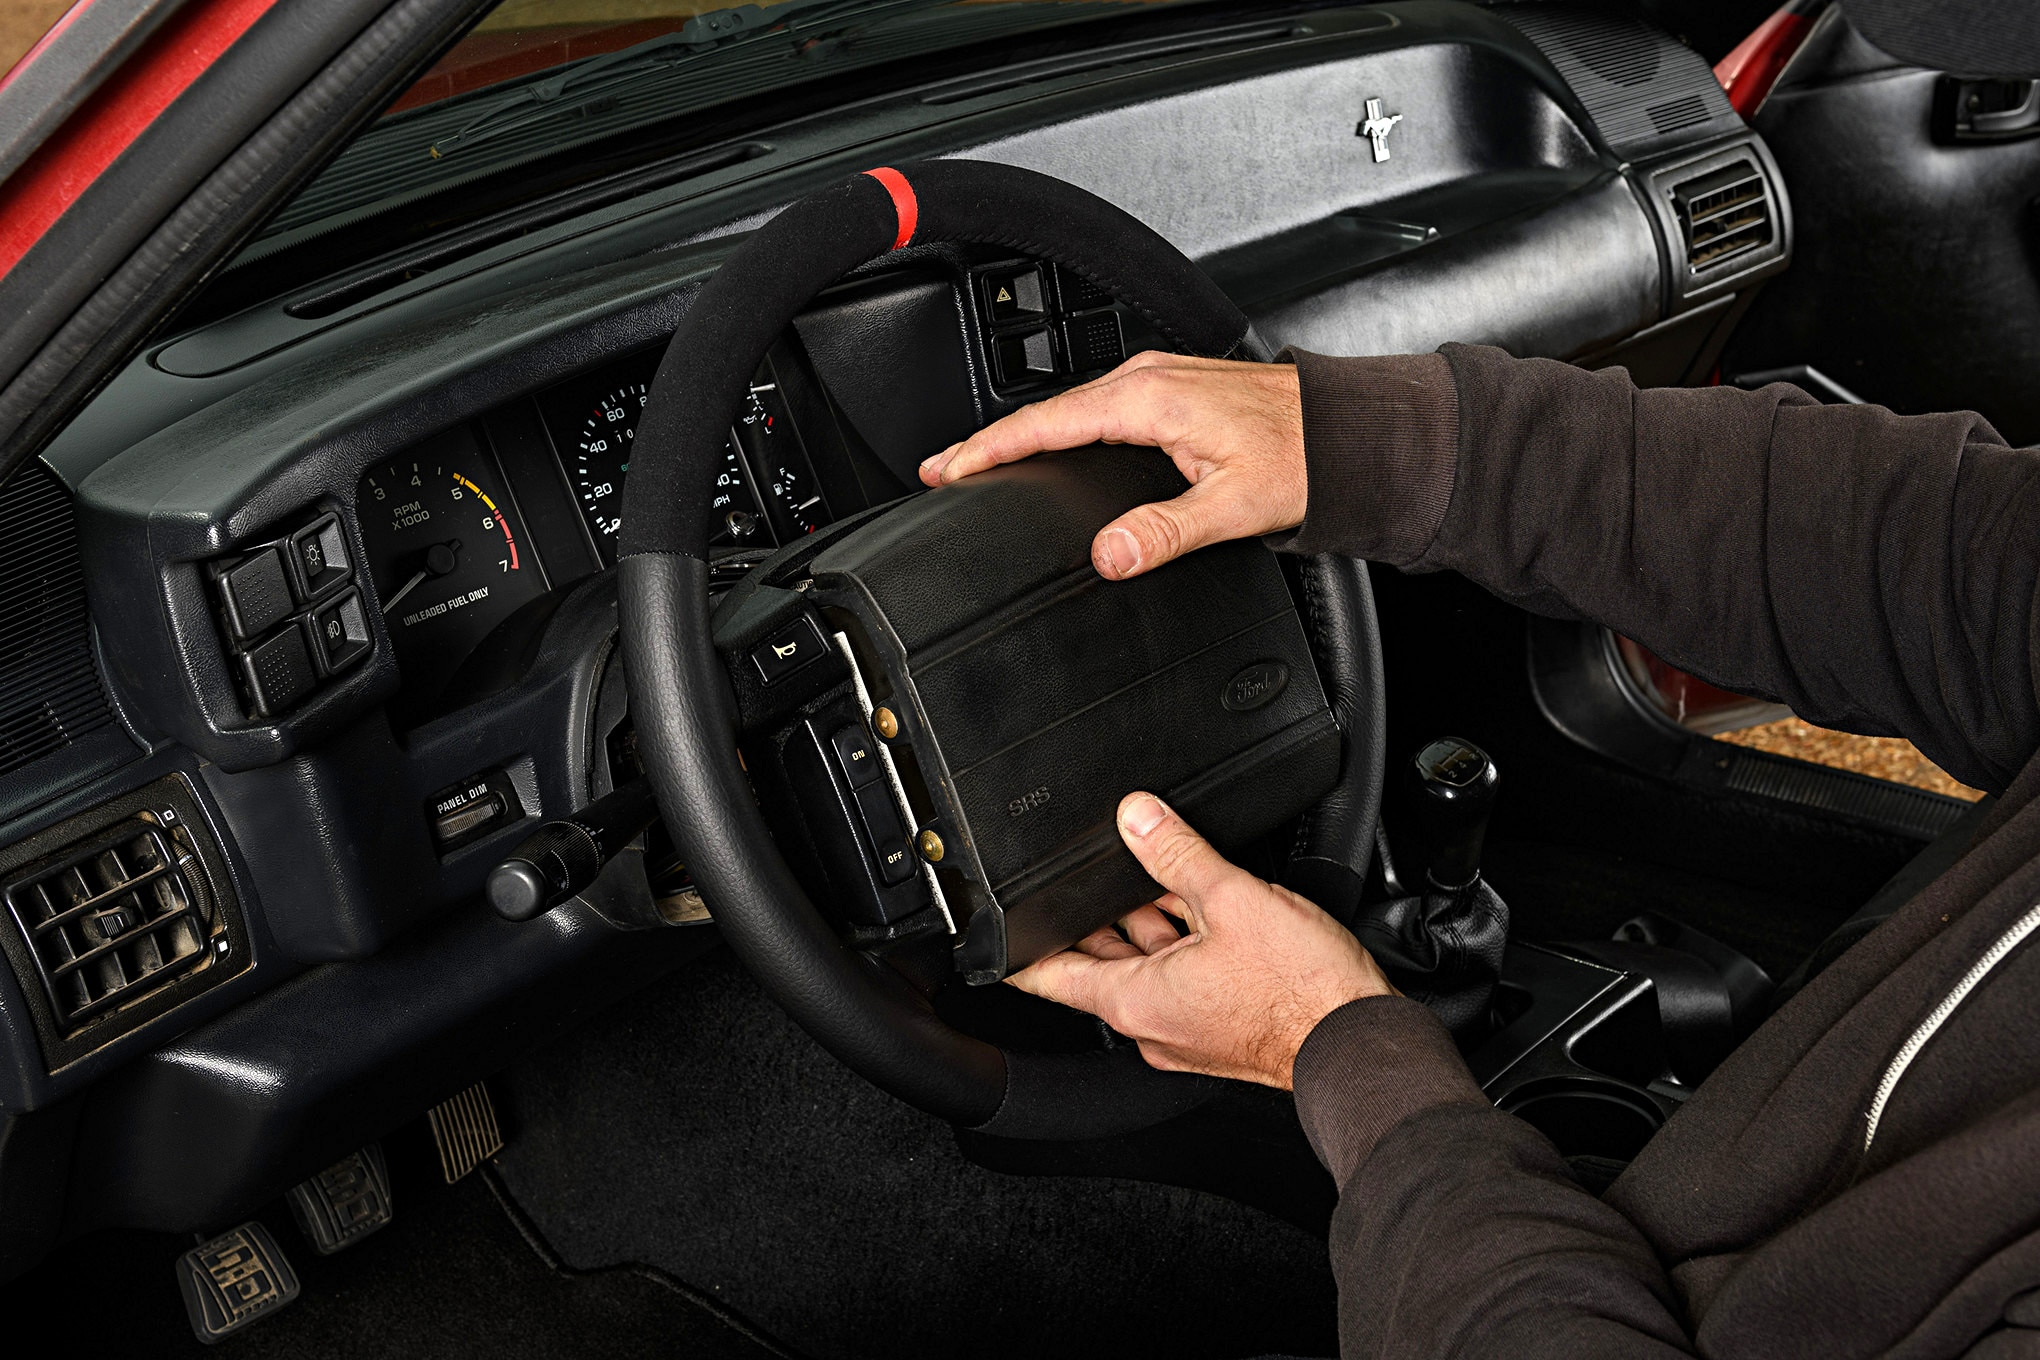 025 Mustang Steering Wheel Air Bag Installation